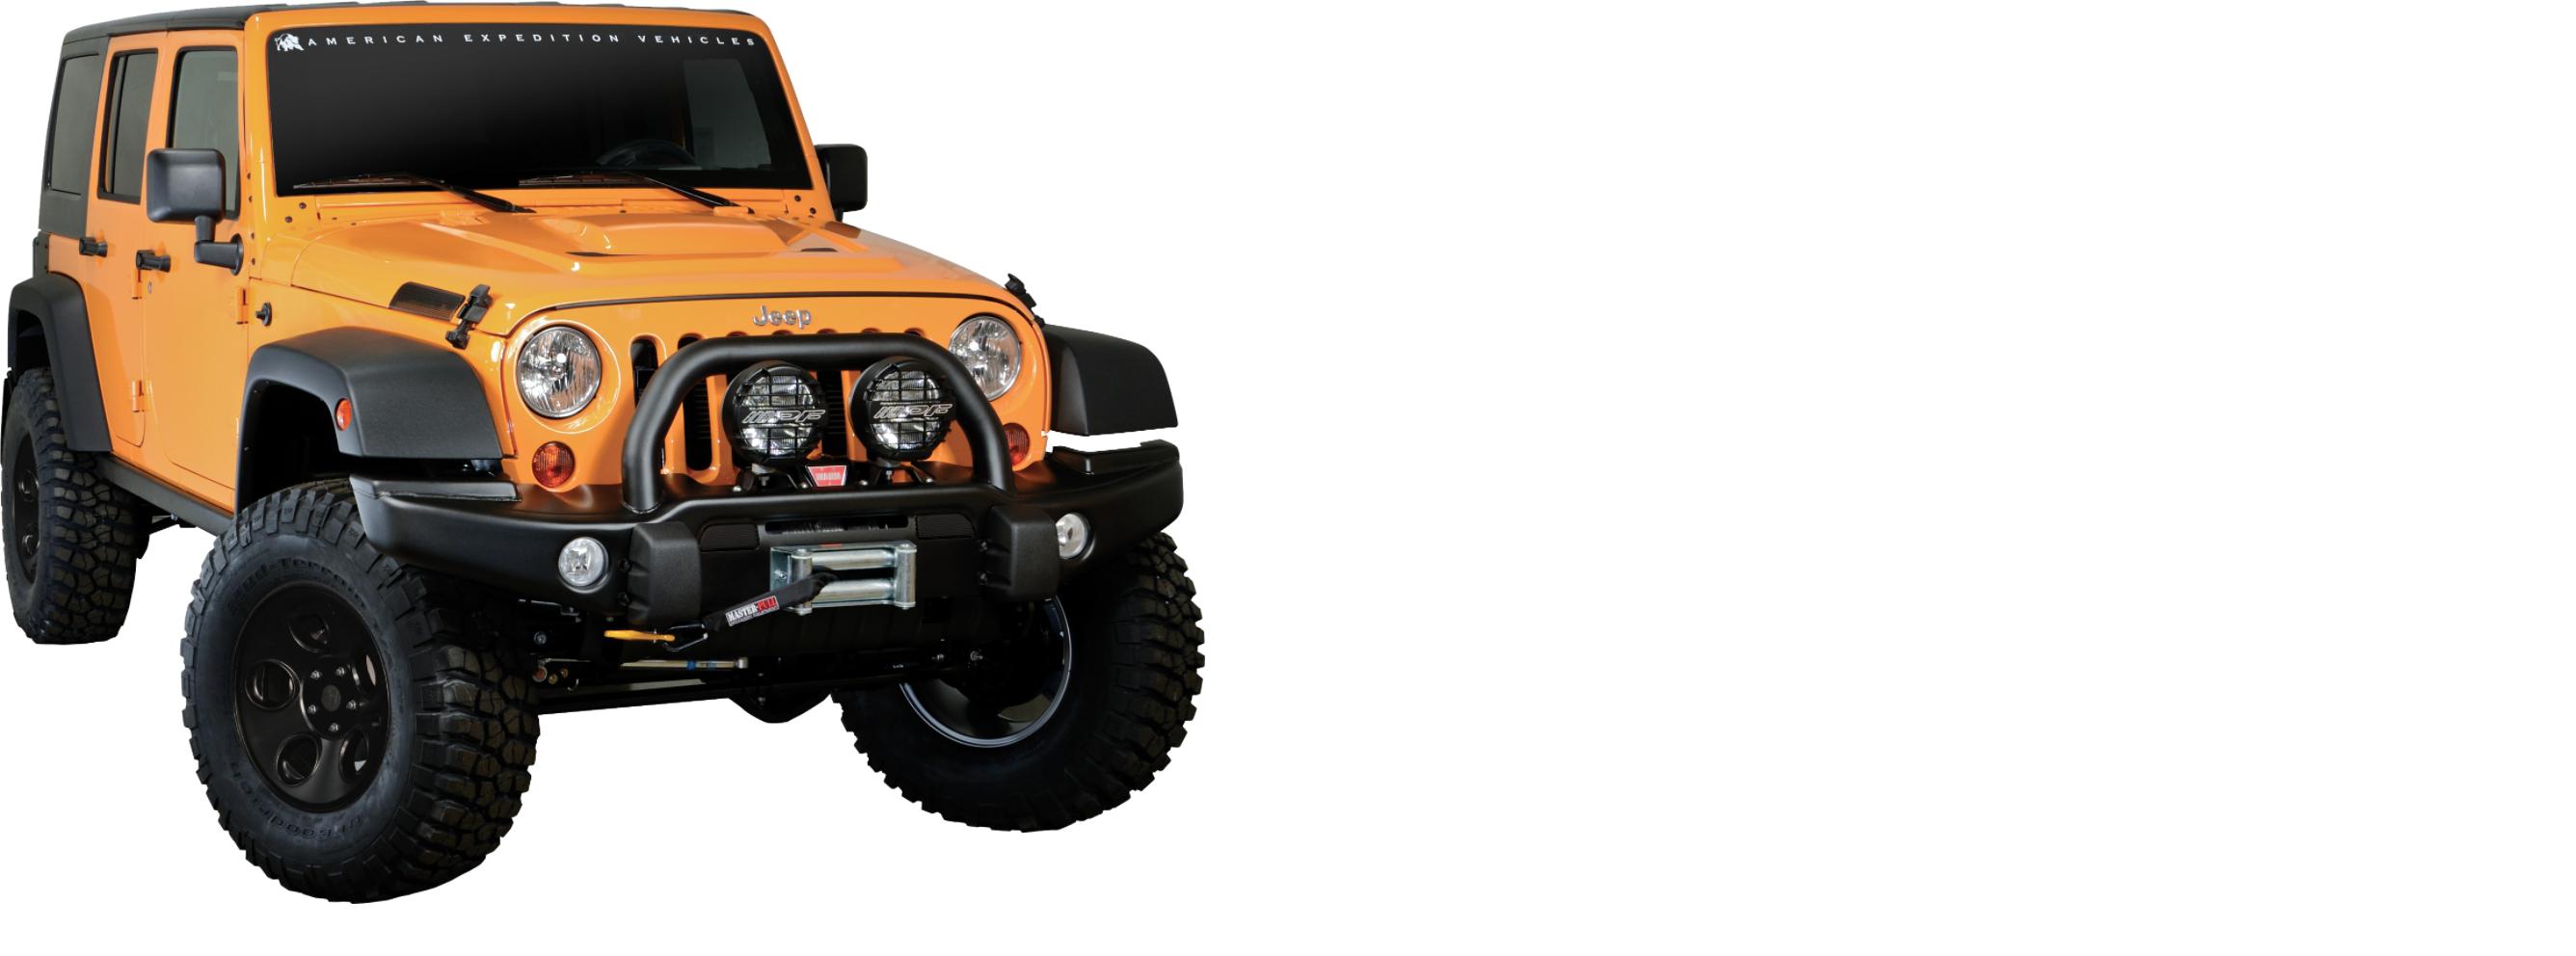 Keene Dodge Chrysler Jeep >> AEV Jeep Wrangler in Keene, NH   Keene Chrysler Dodge Jeep Ram